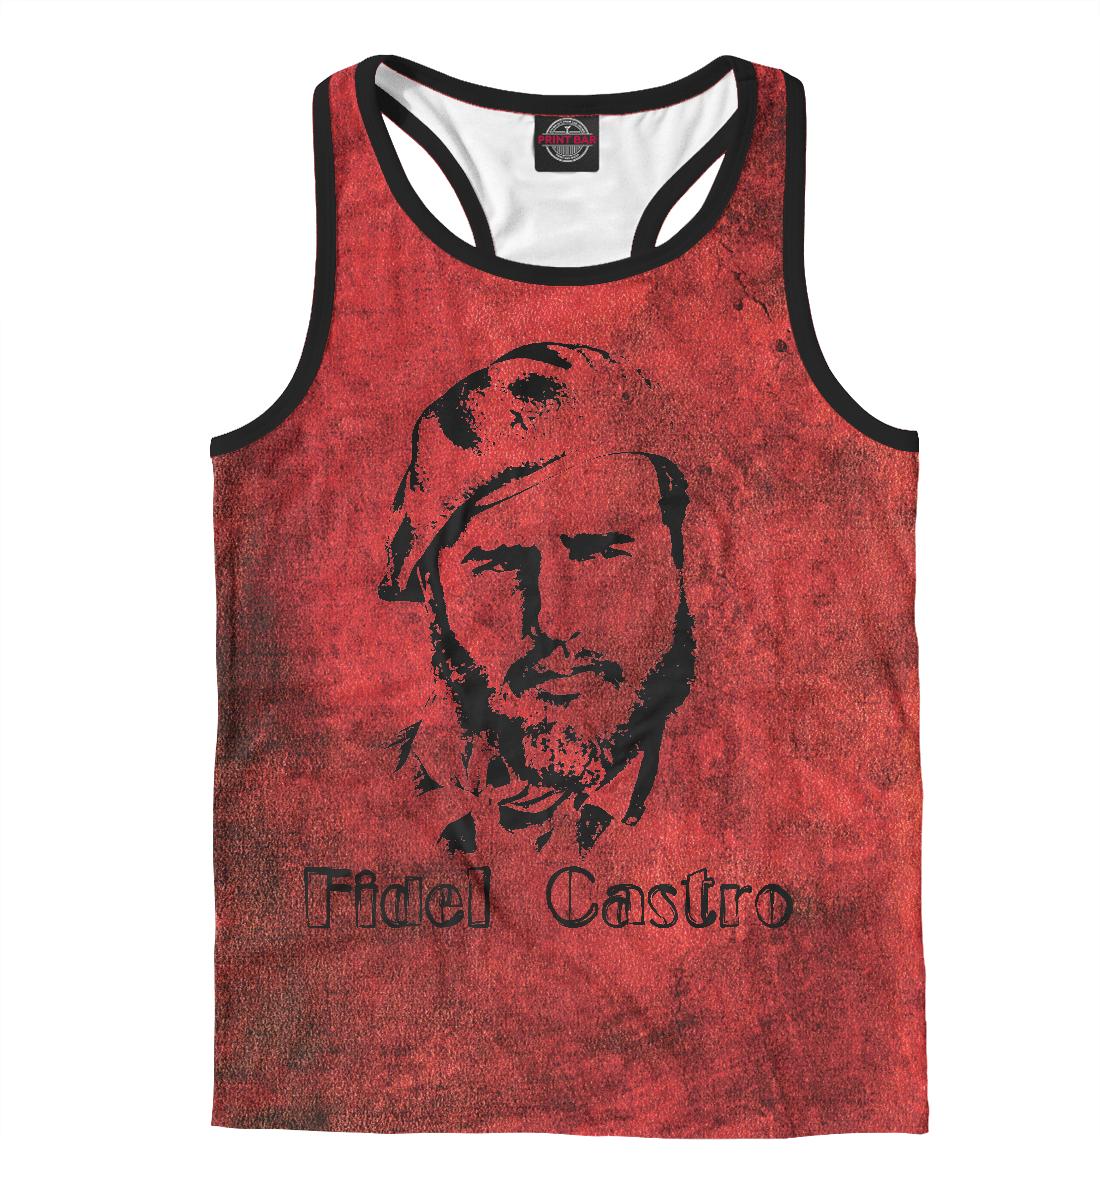 Fidel Castro nelcy echeverría castro arquitectura vulgaris